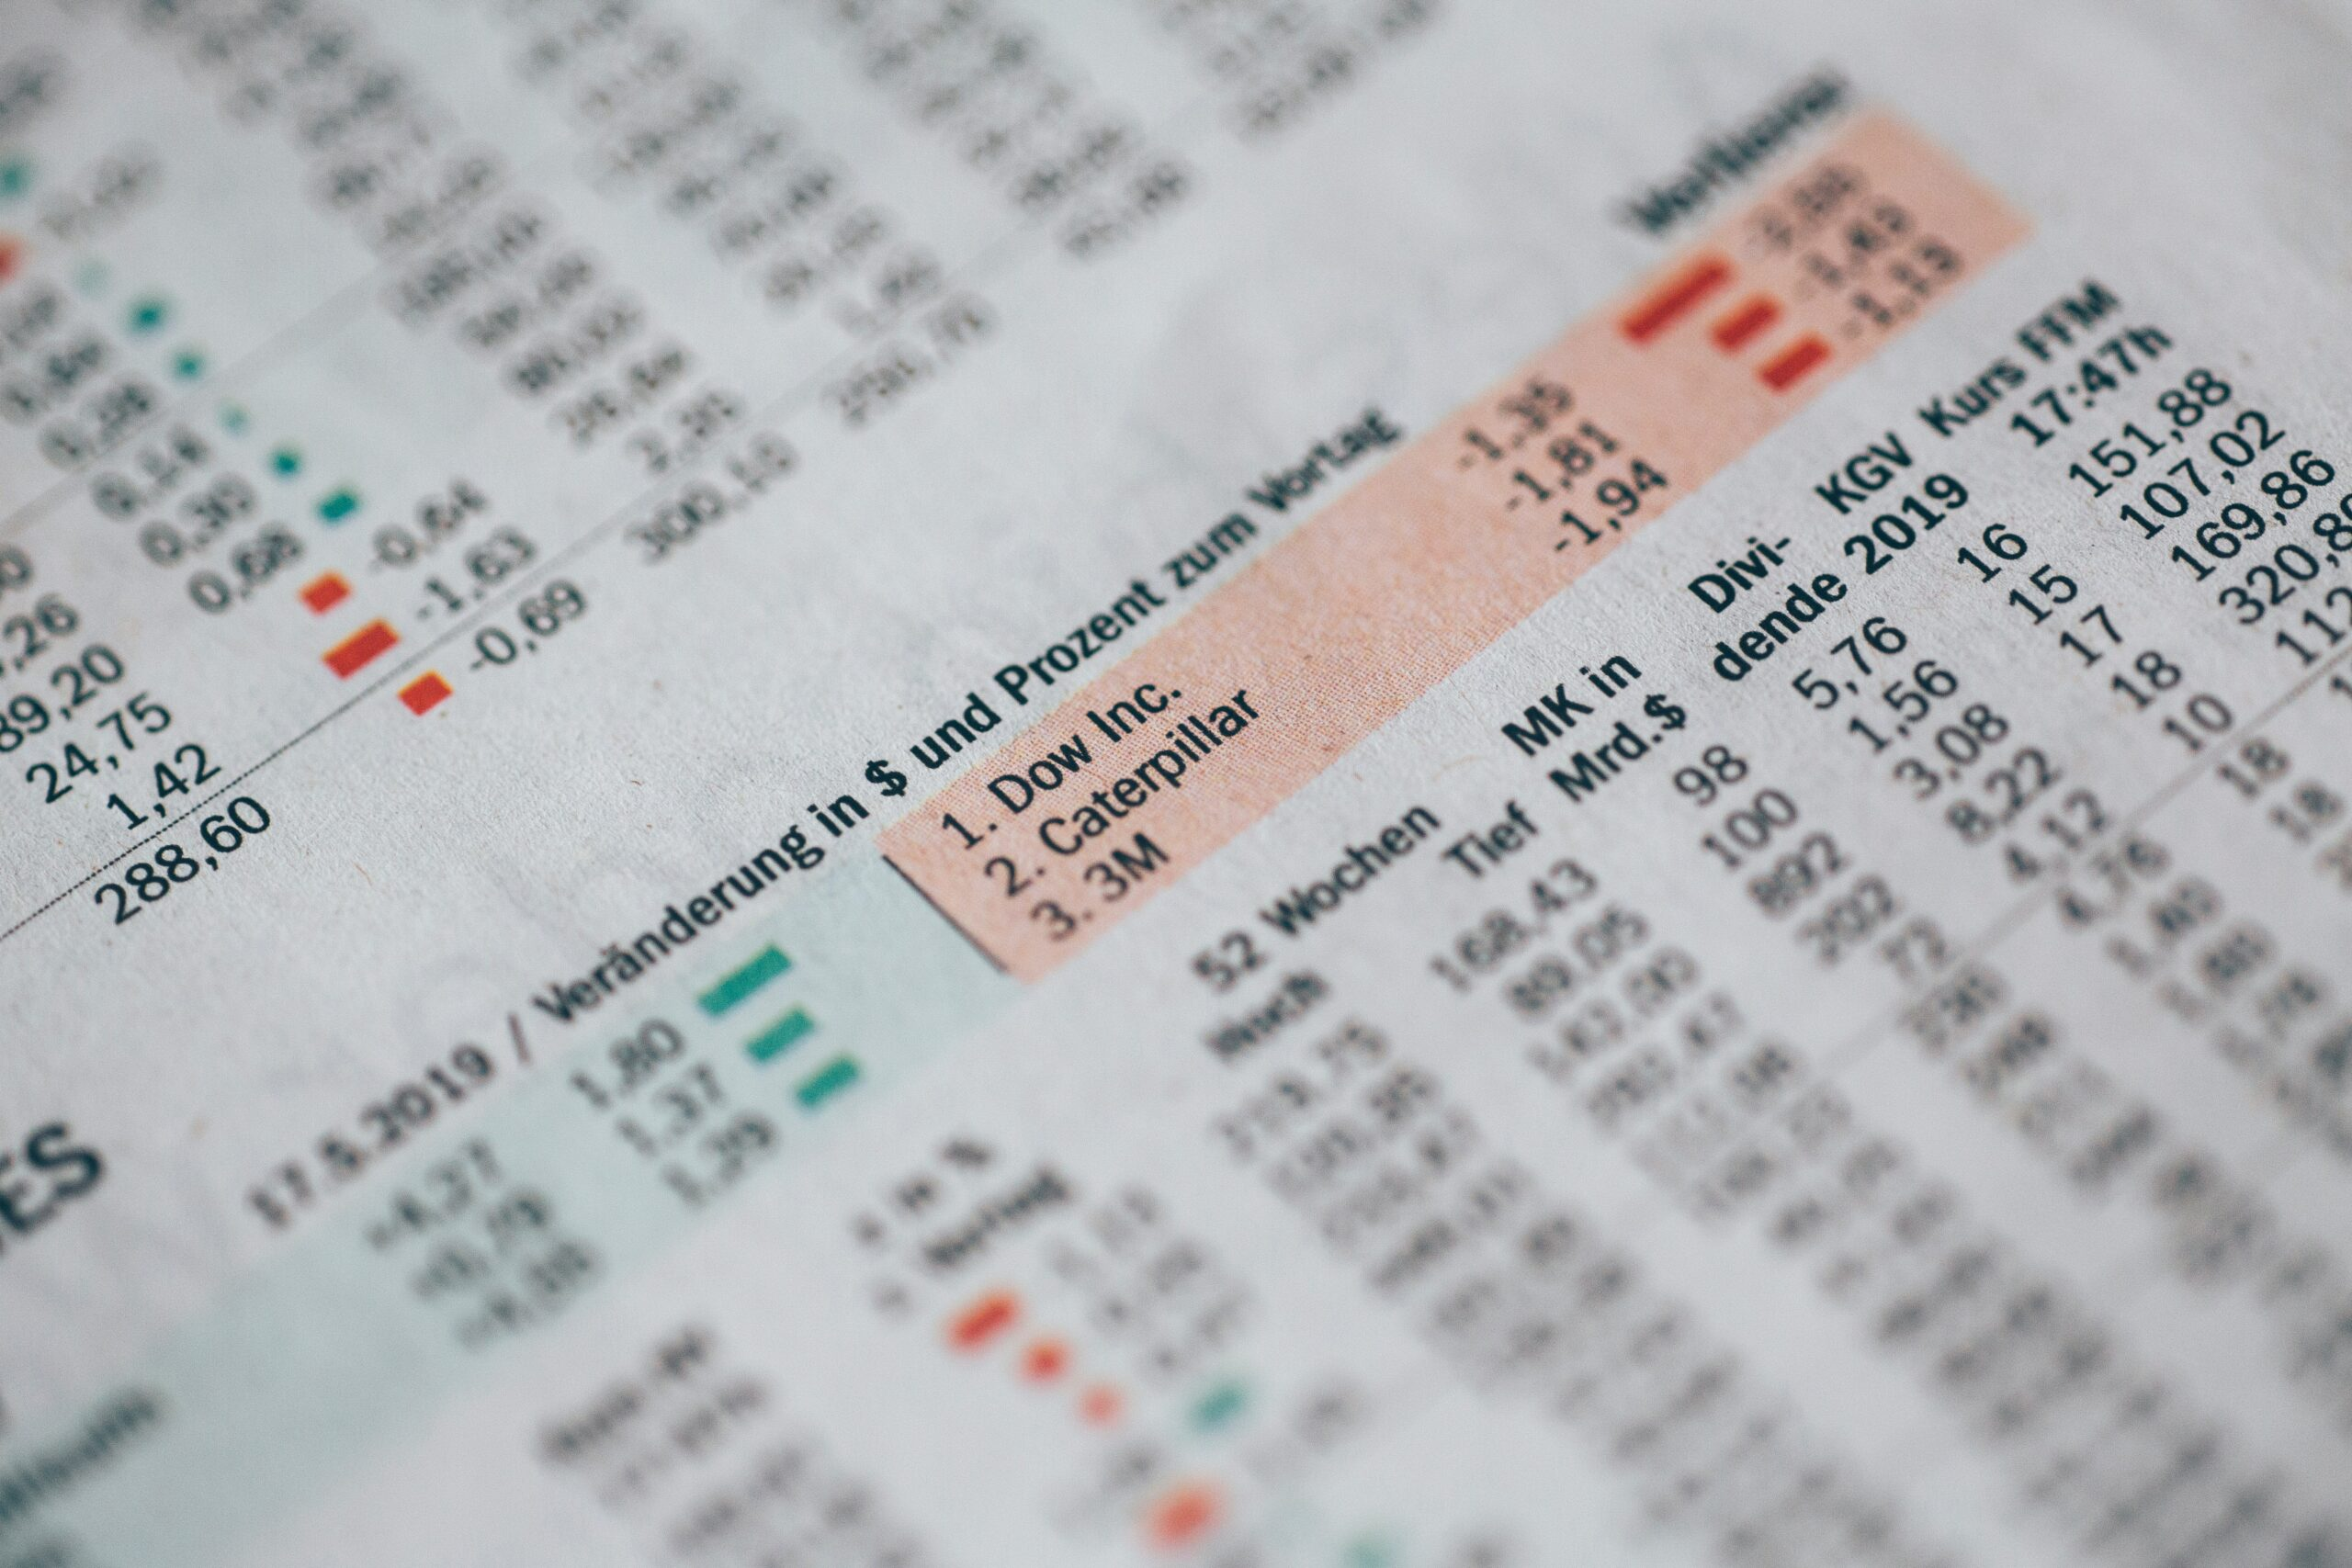 2020-04-01: COVID-19 Sharpens PowerON's Market Focus